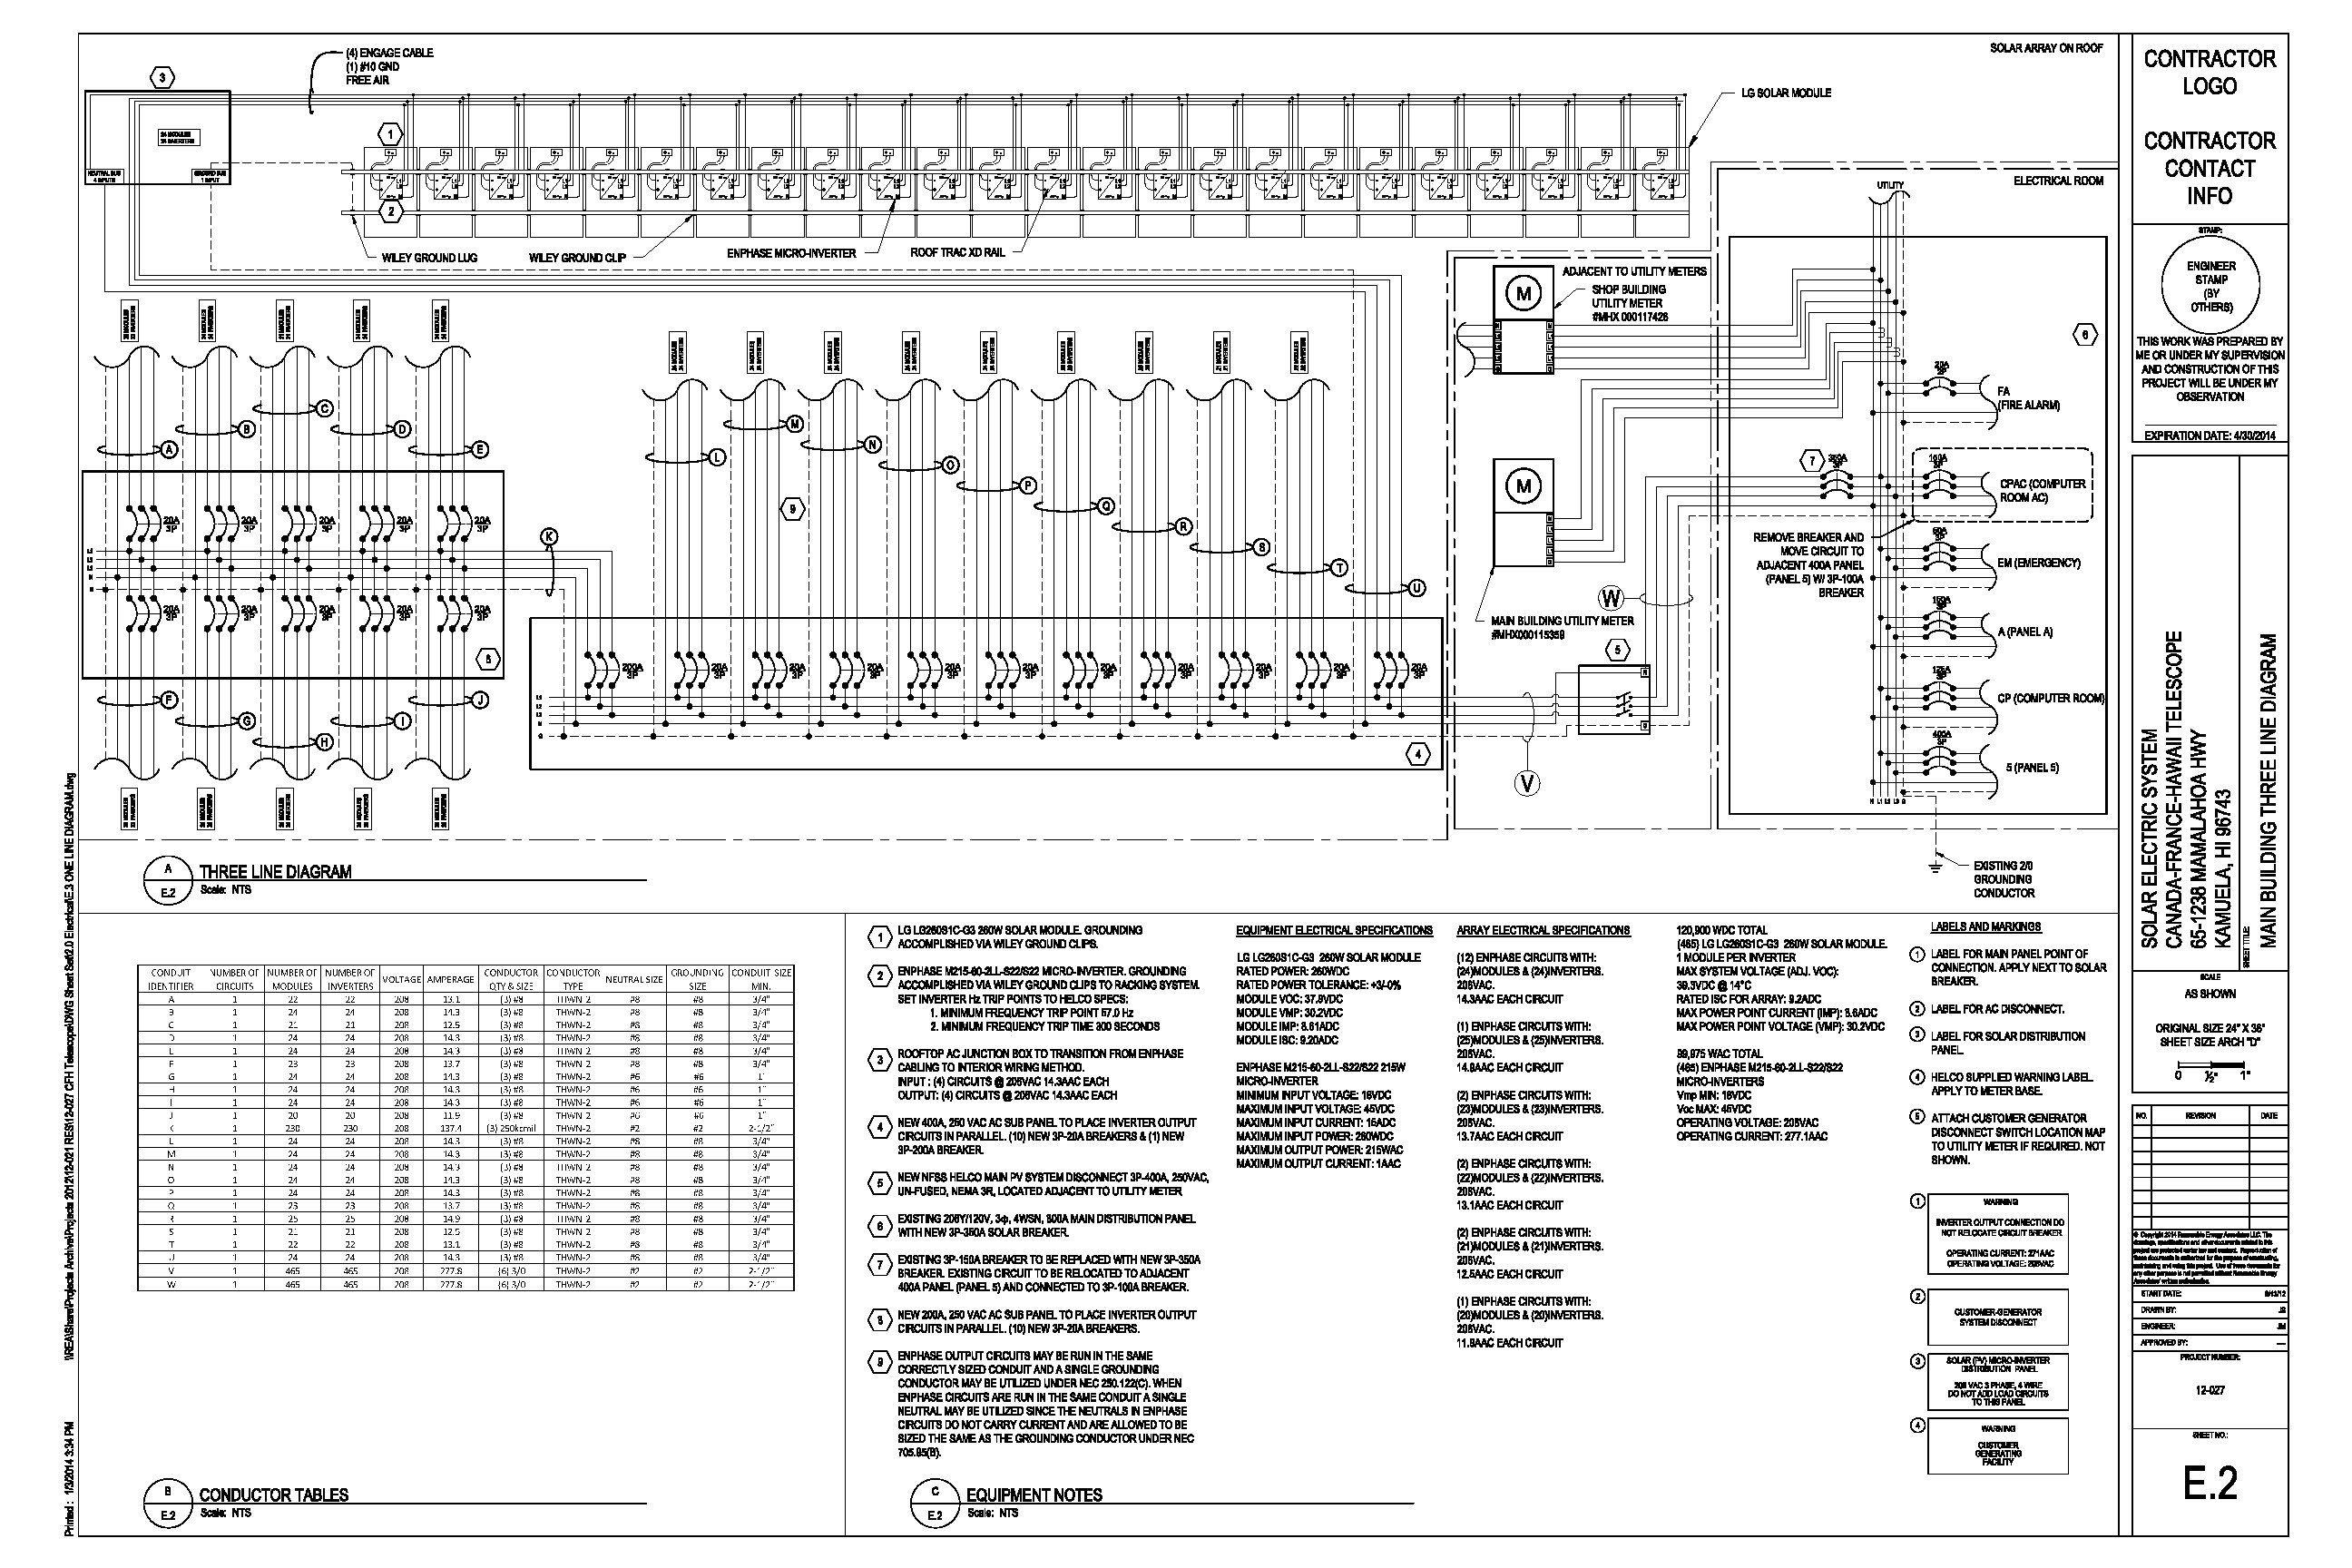 Pv System Wiring Diagram Kgt Best Of